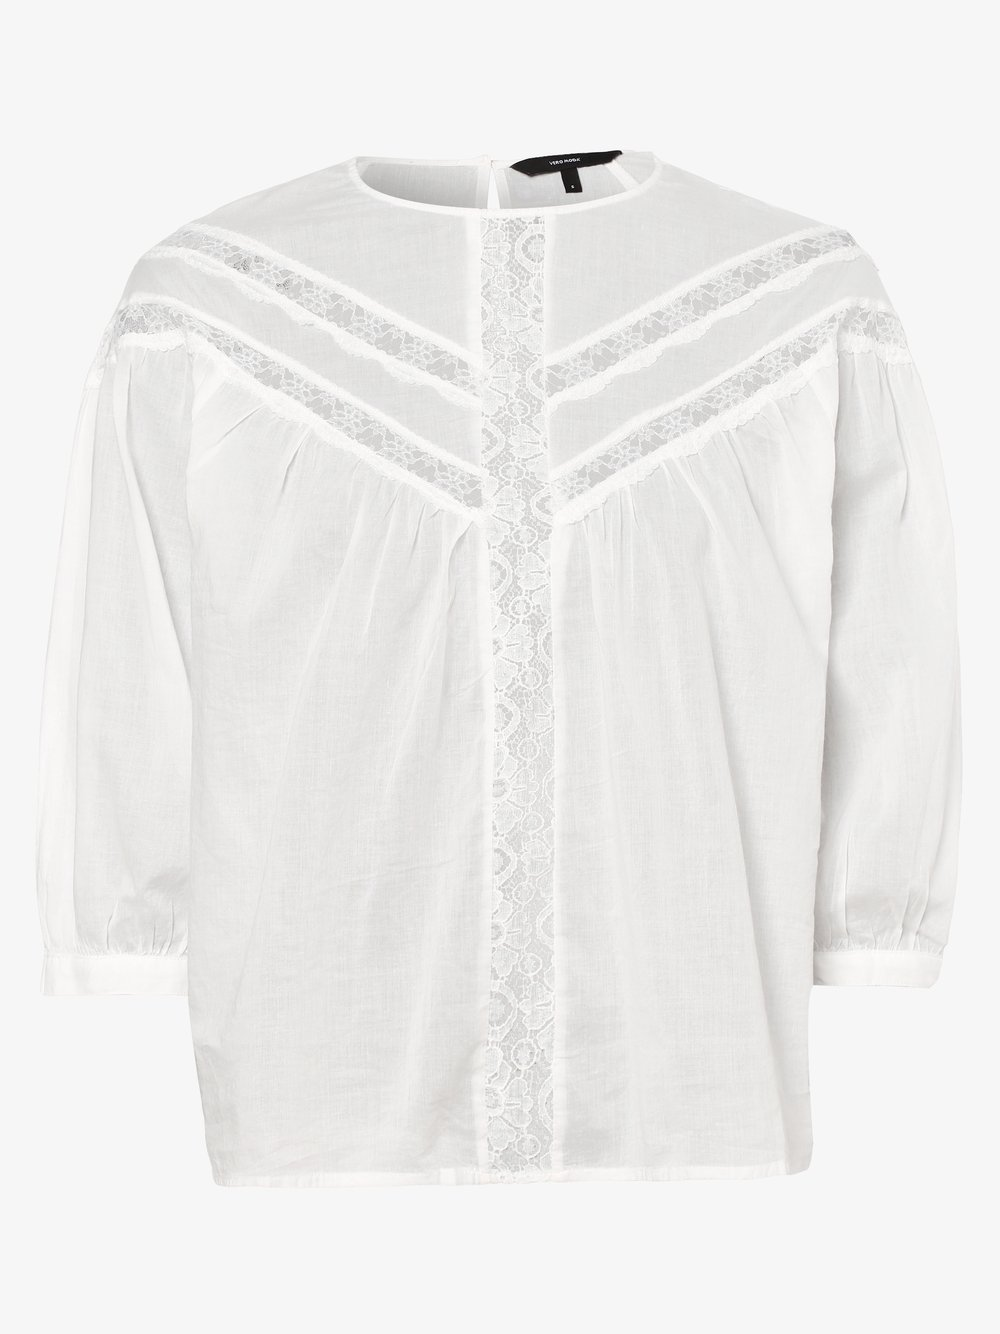 Vero Moda – Bluzka damska – Vmtiffany, biały Van Graaf 466406-0002